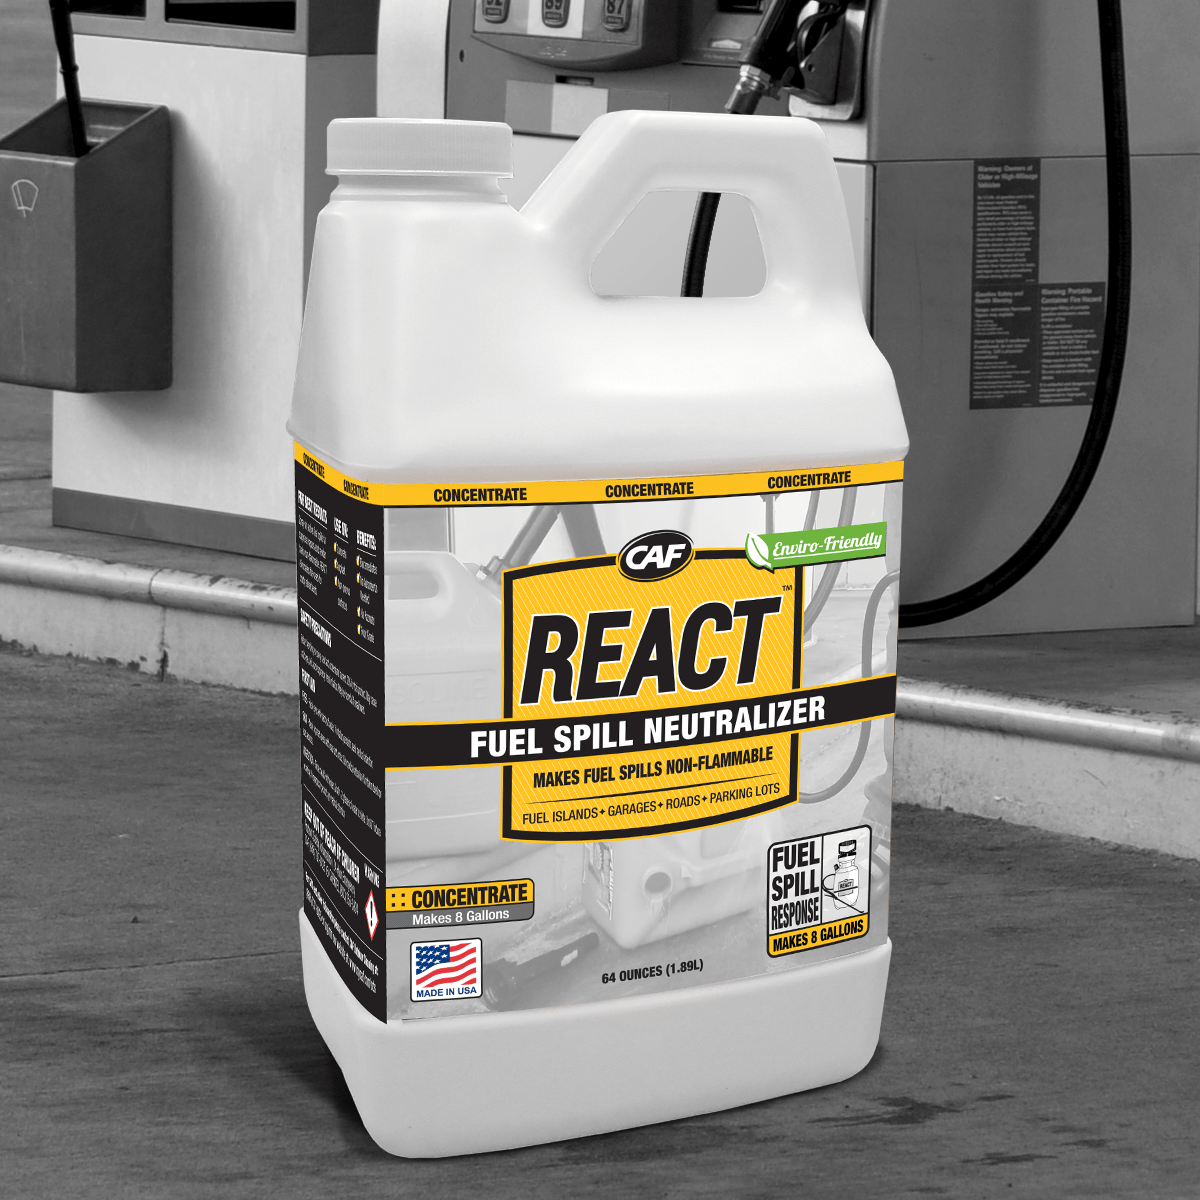 REACT prime Fuel Spill Neutralizer